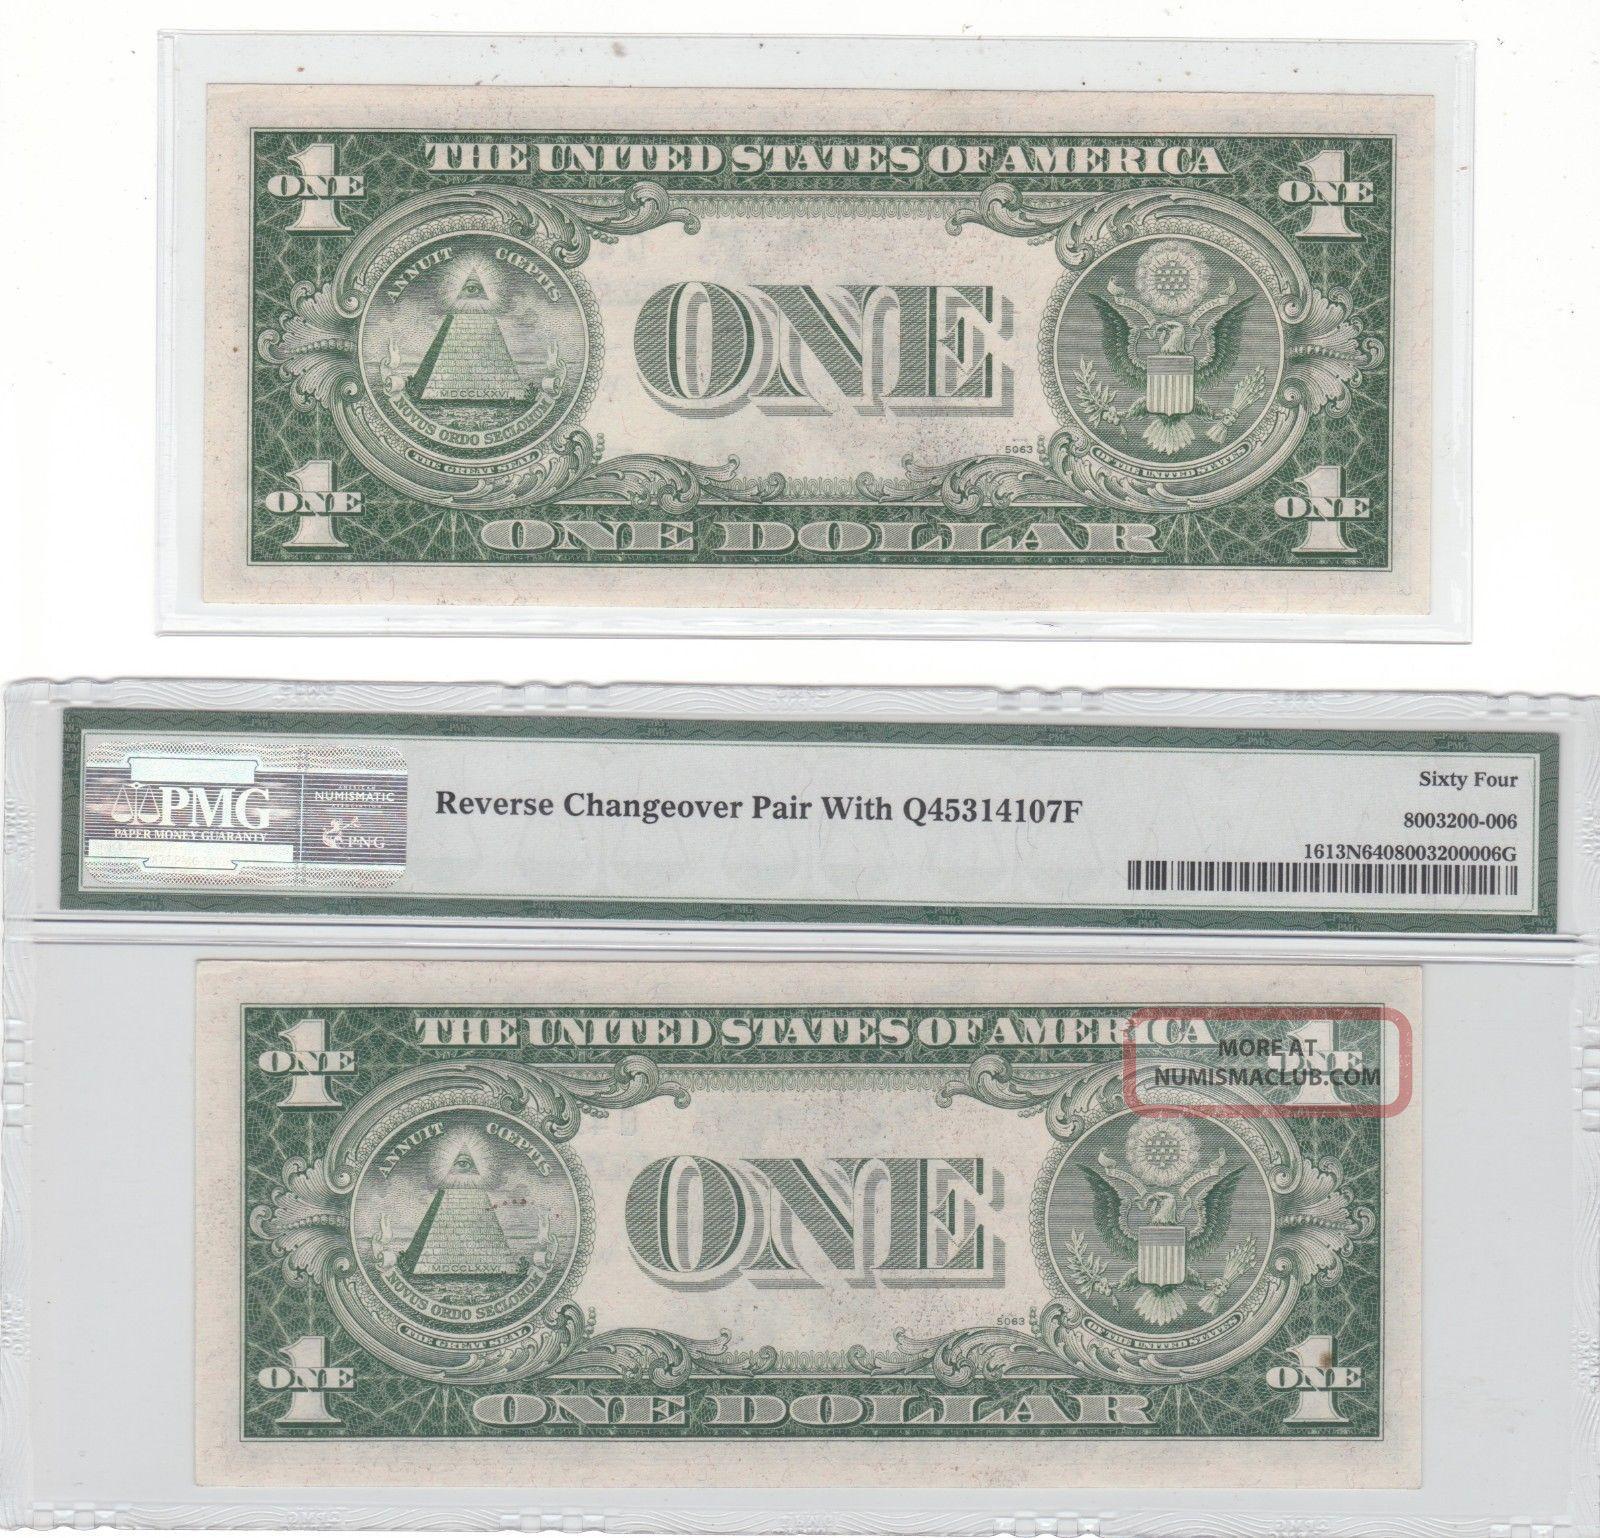 Value D Certificate 1935 Value Silver